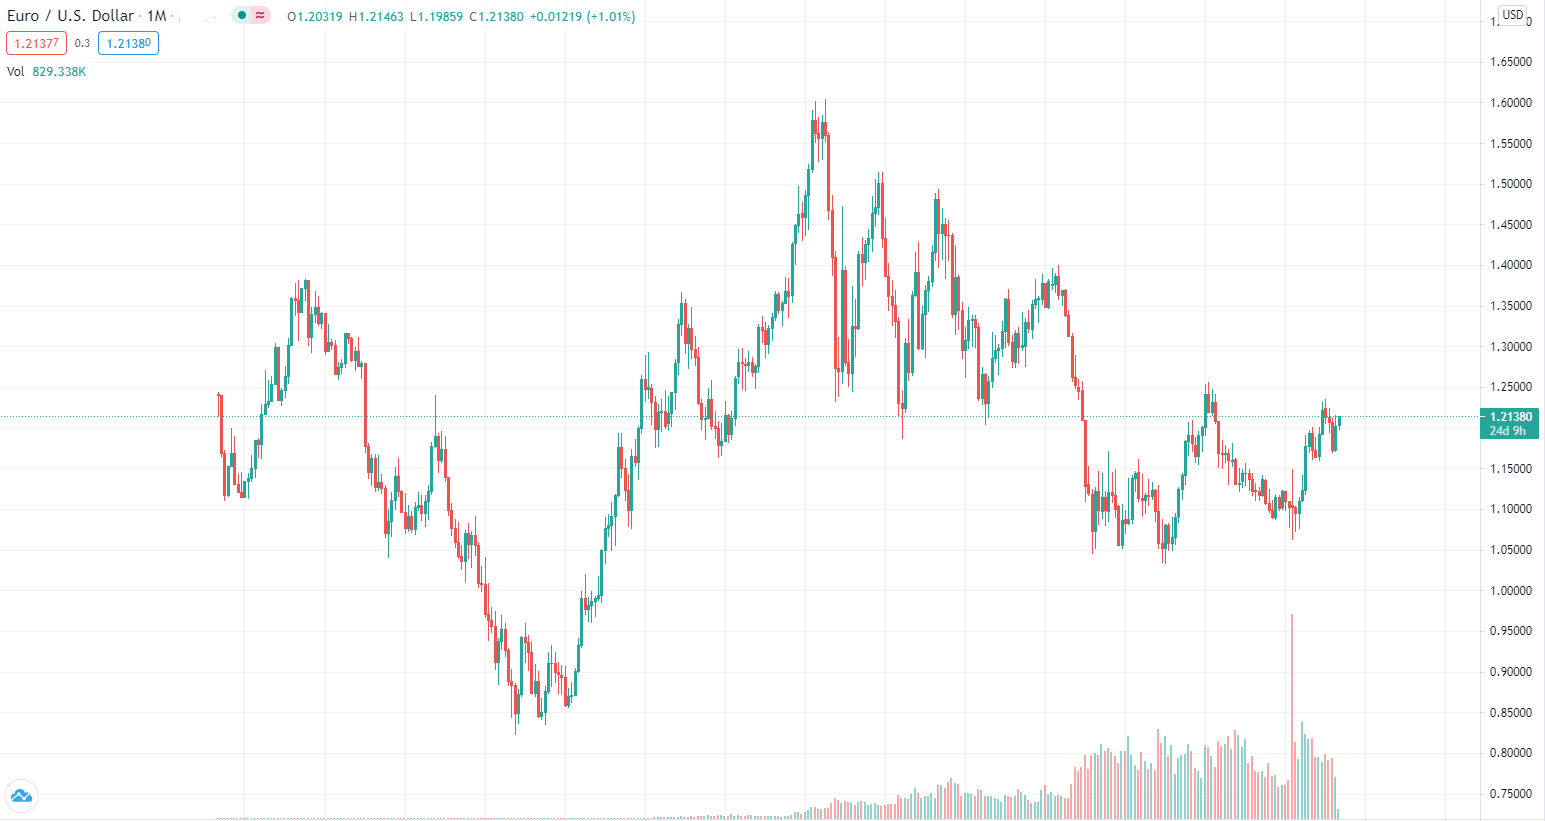 Dogecoin market price